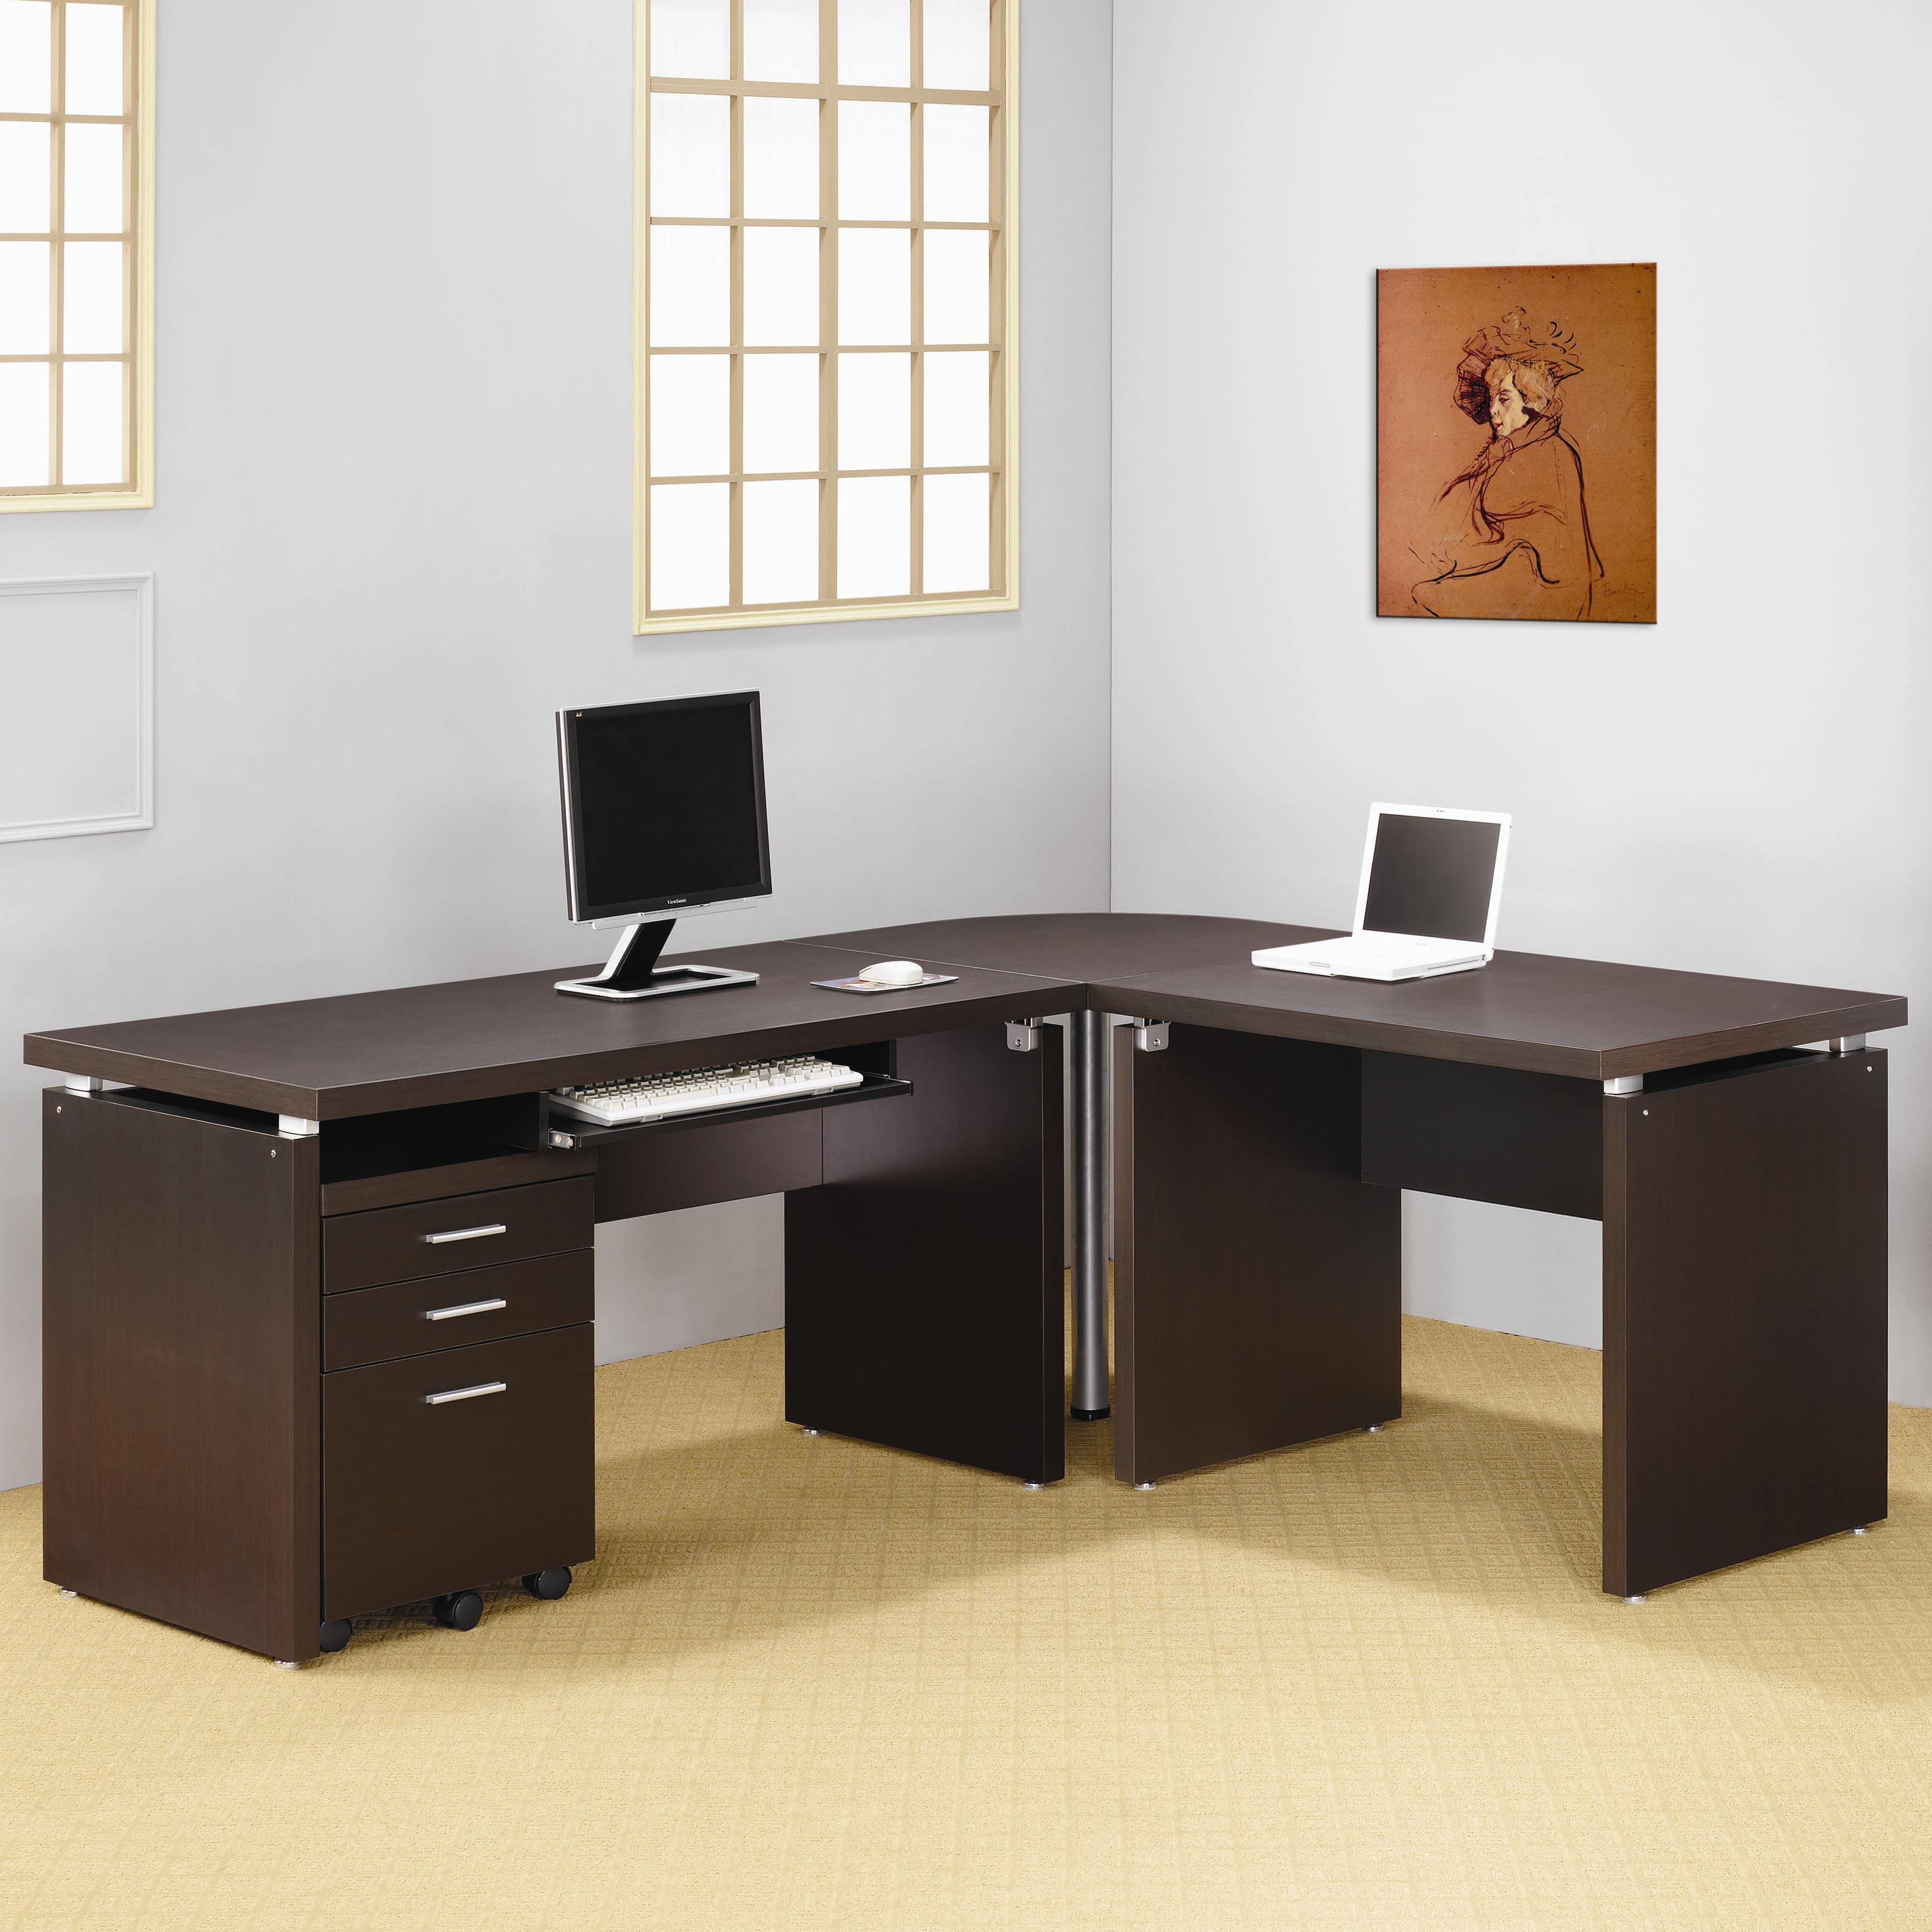 Skylar L Shape Desk by Coaster at Northeast Factory Direct